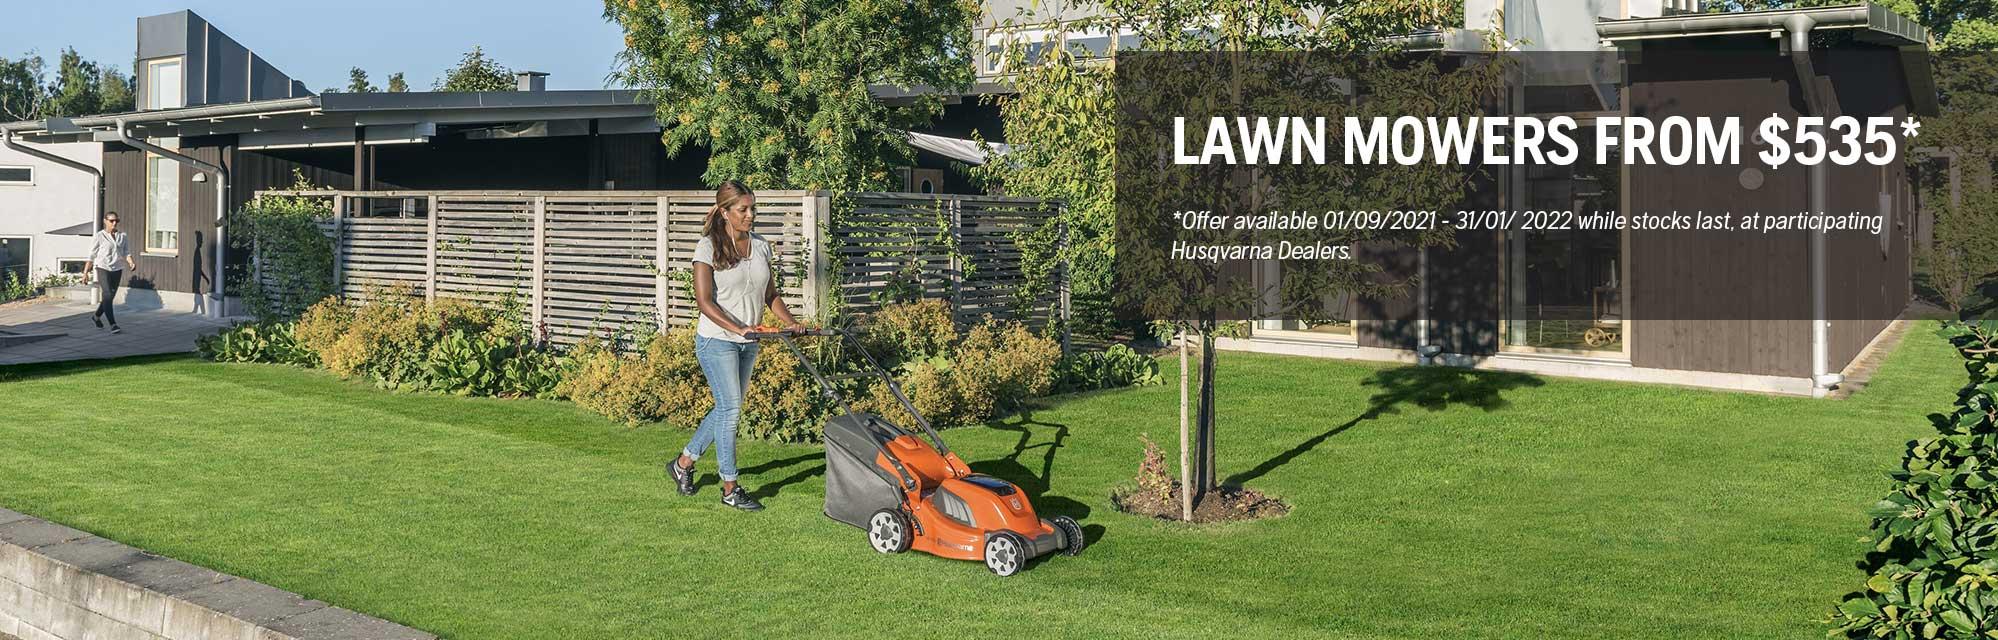 10 Lawn Mower - Spring